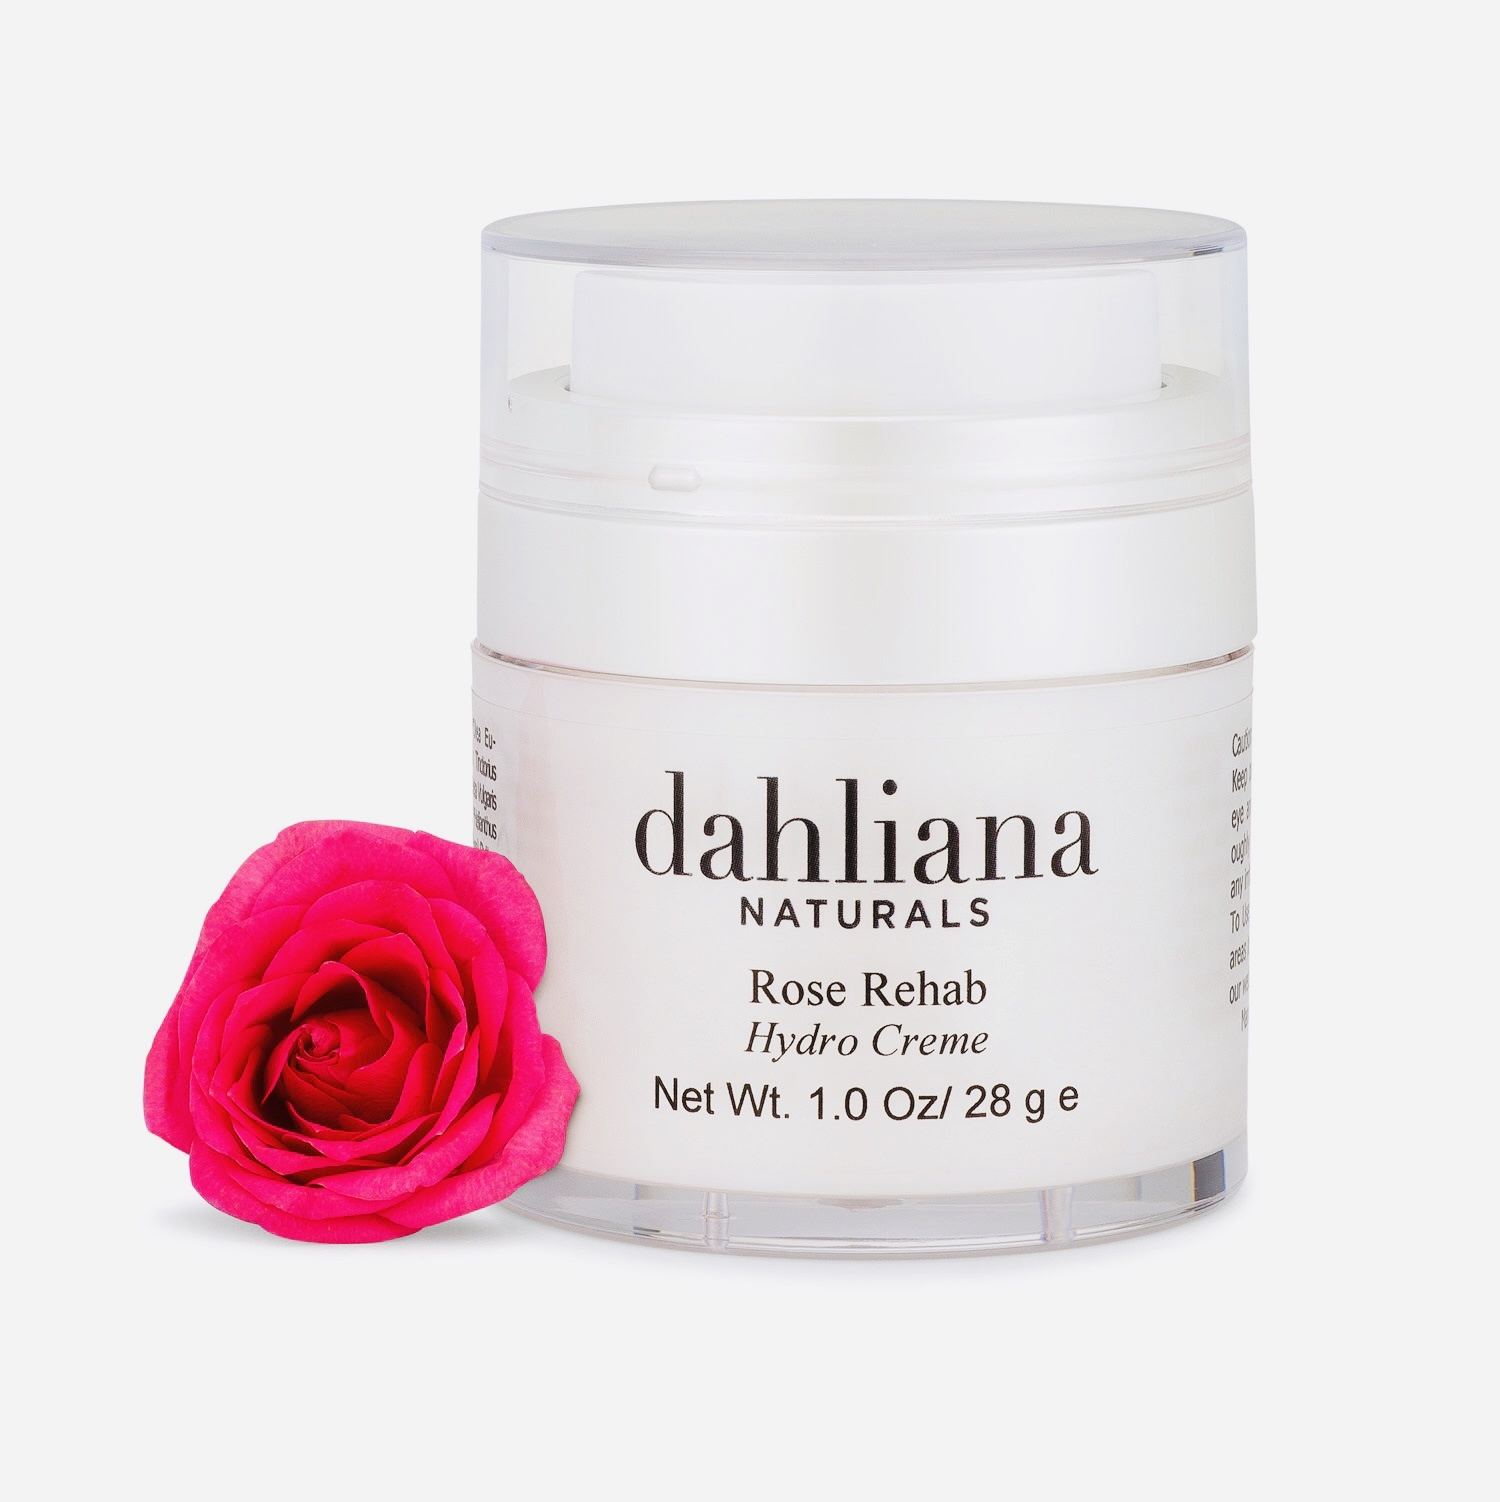 Dahliana Rose Rehab Creme-1.0 oz